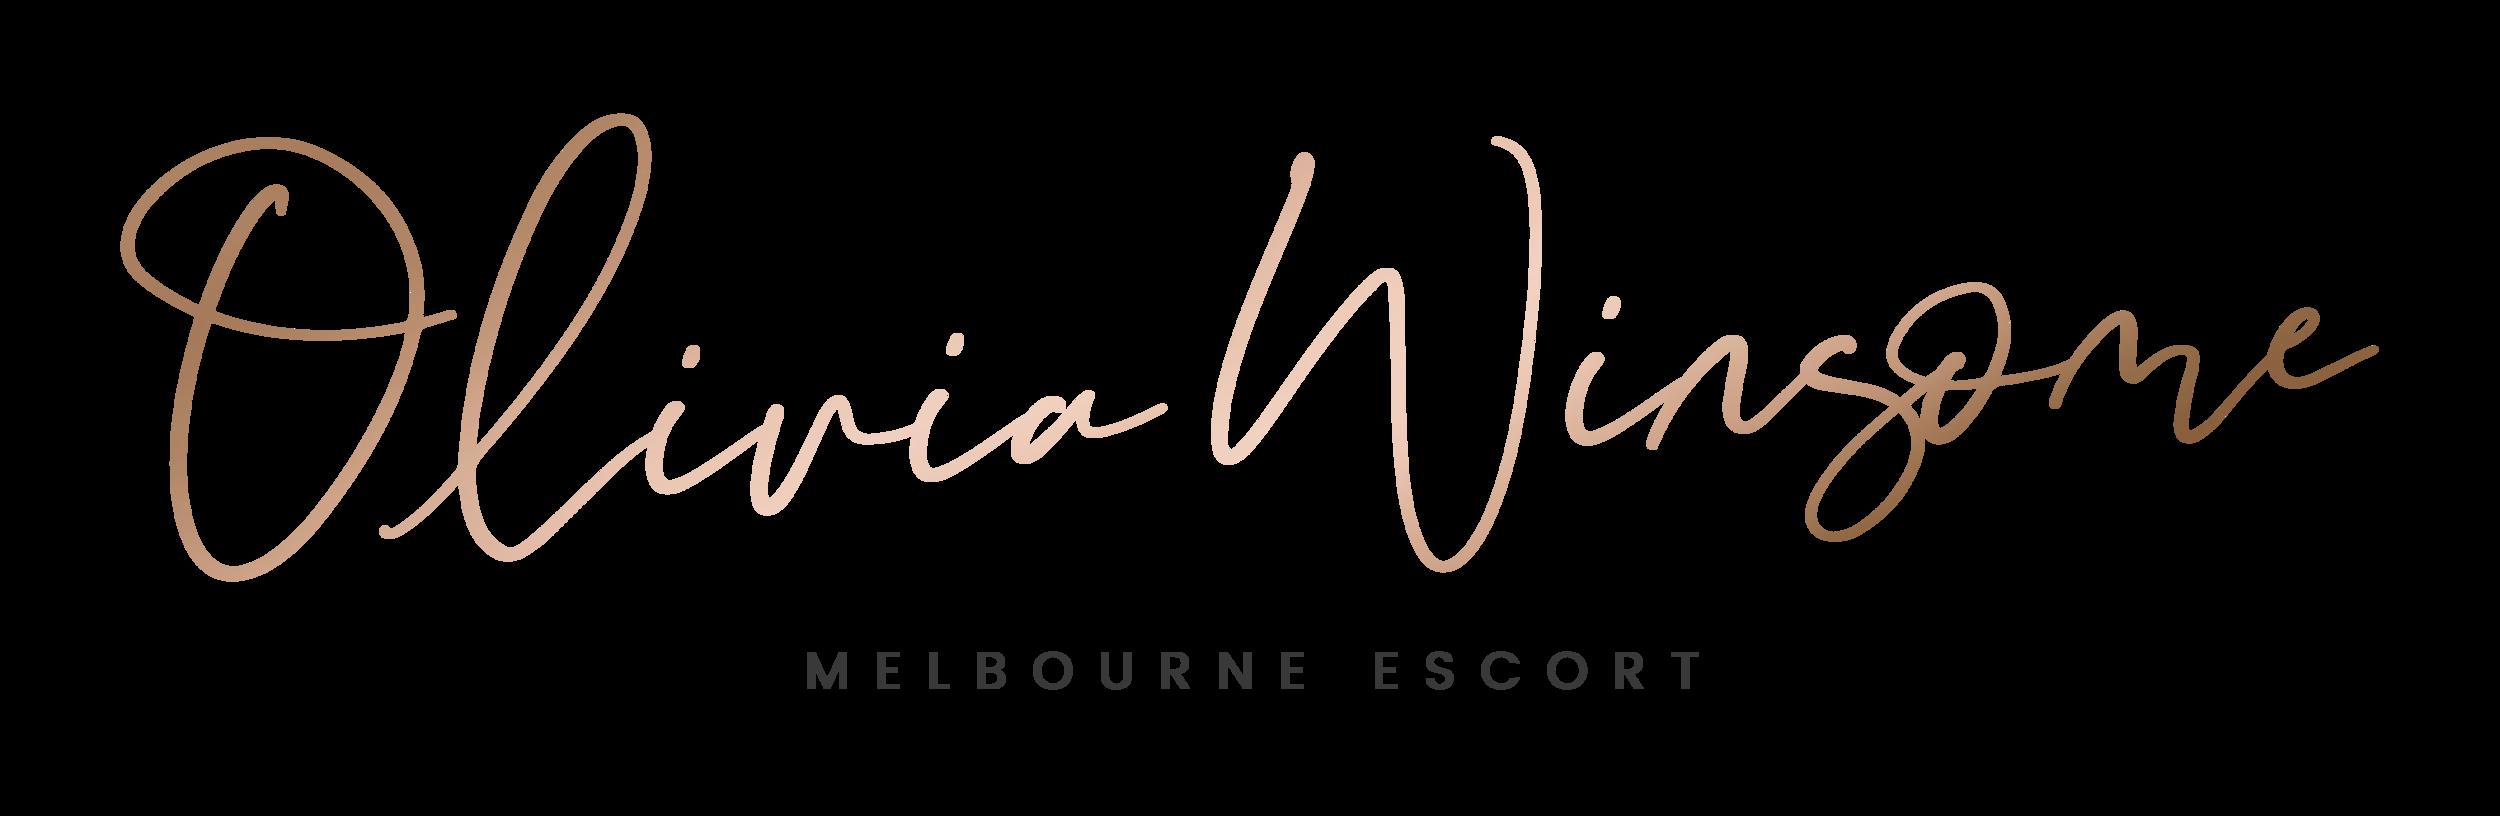 Olivia-winsome-logo-signiture